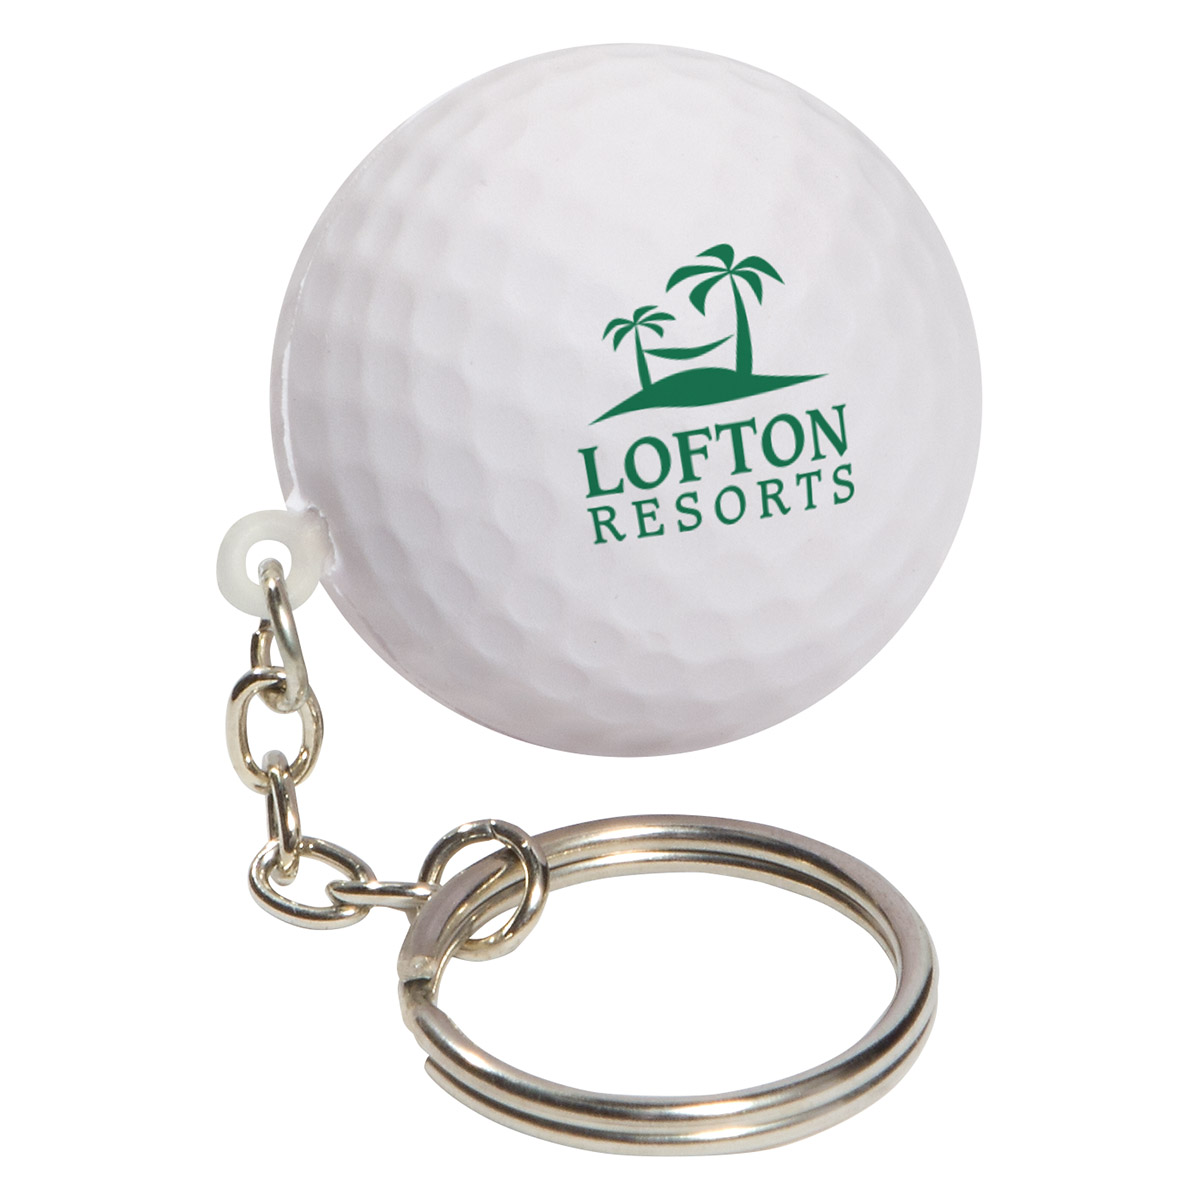 Golf Ball Stress Reliever Keychain, LKC-GF04 - 1 Colour Imprint